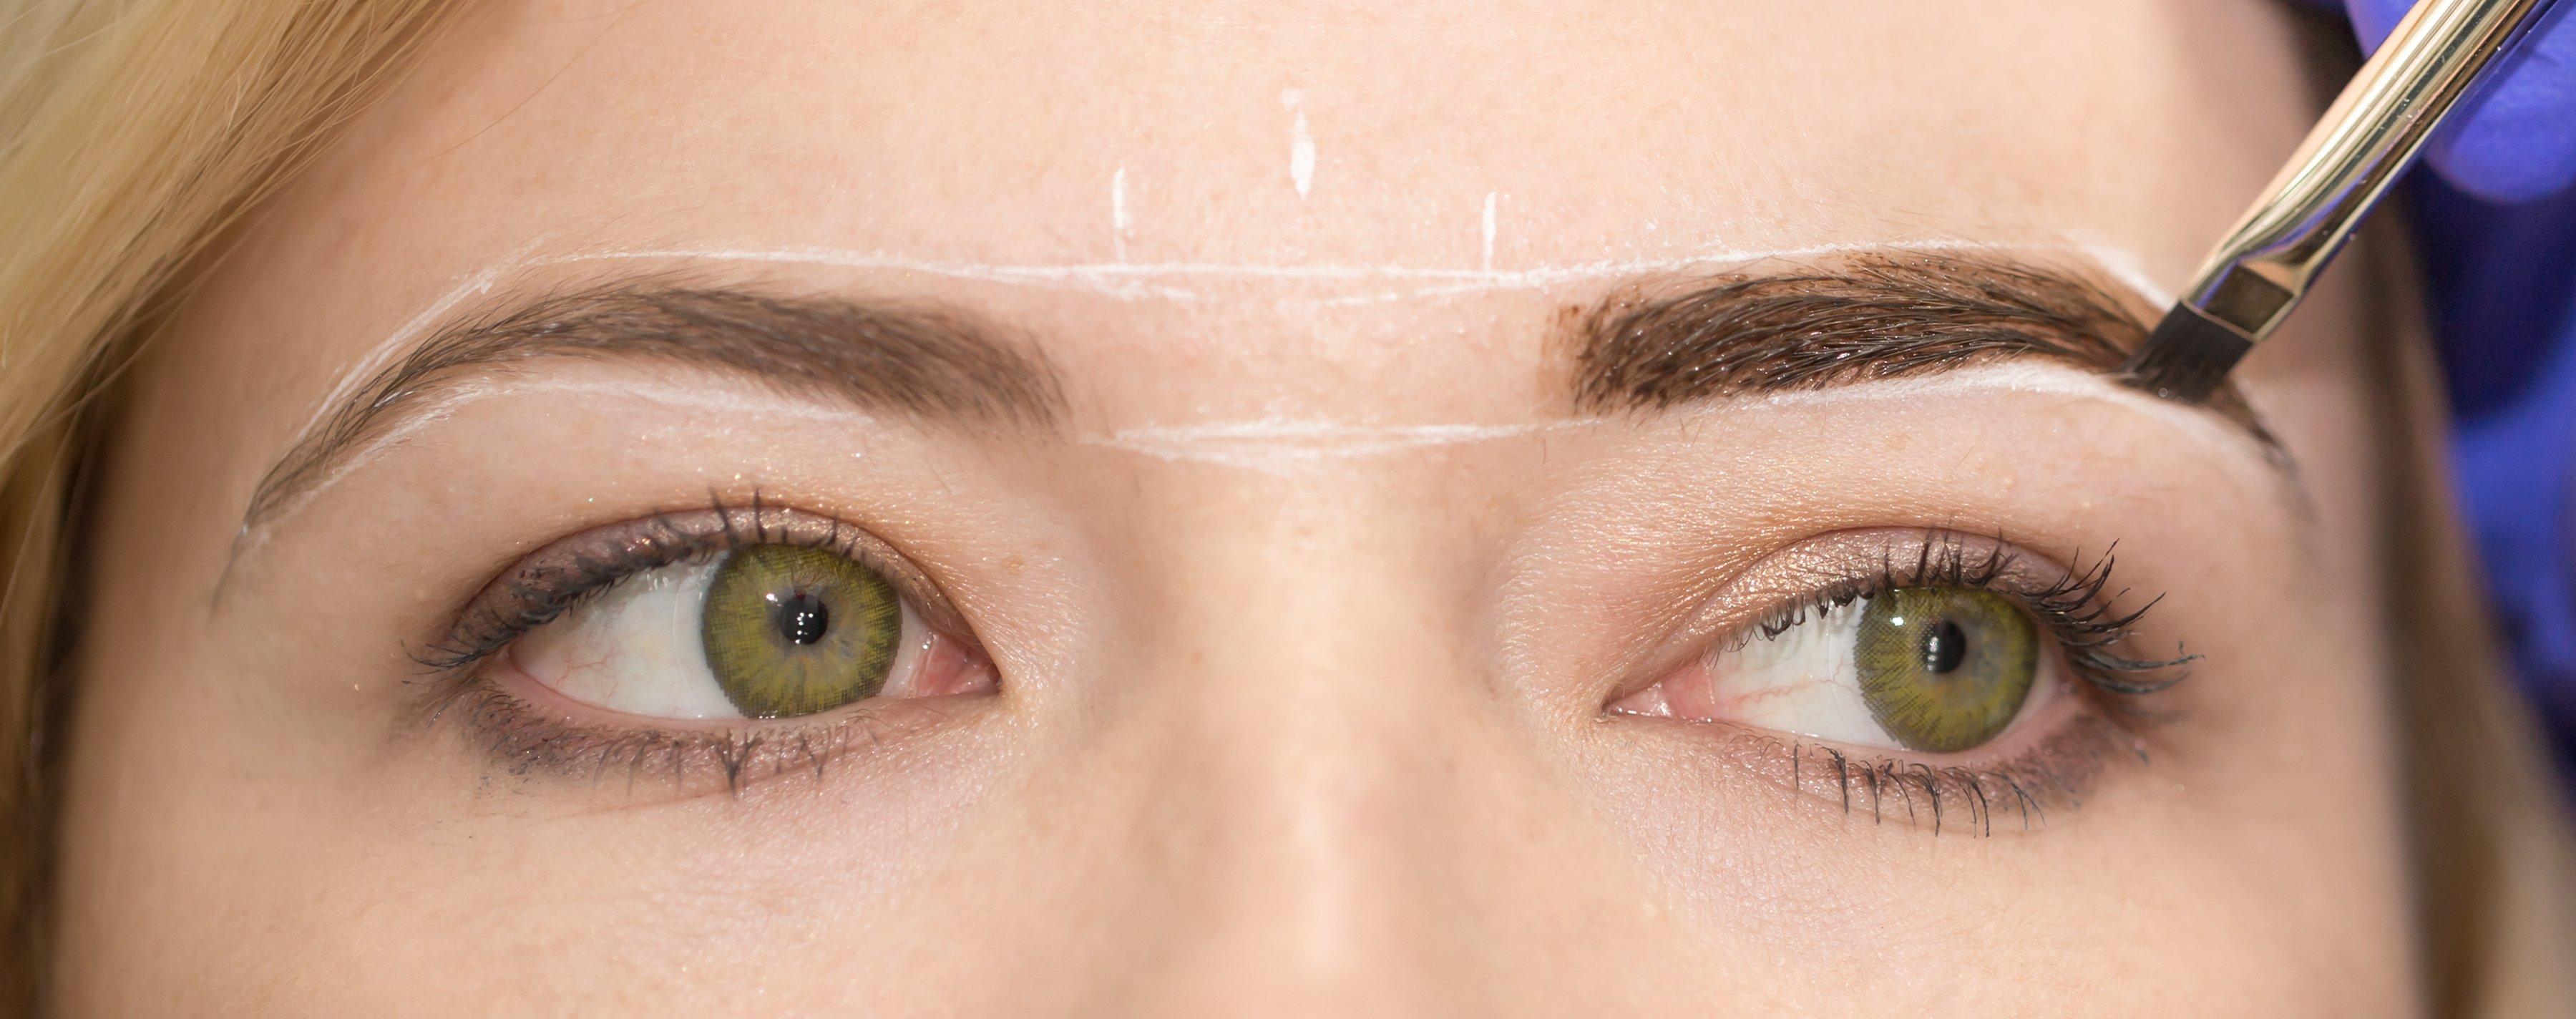 Mujer maquillándose las cejas.   Foto: Shutterstock